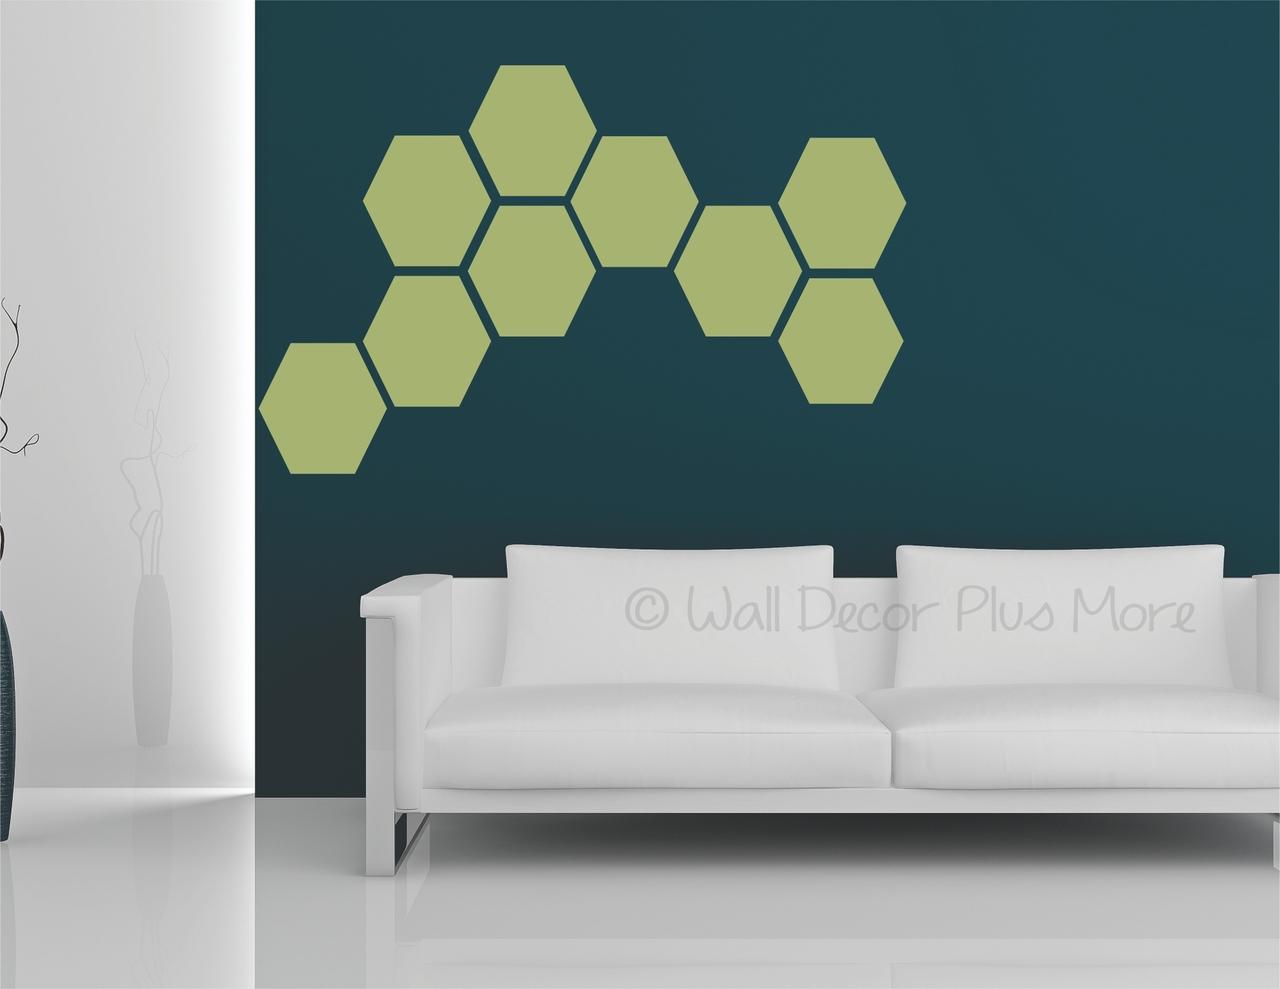 Hexagon Wall Stickers Shapes Vinyl Decals Honeycomb Art Decor 7inch 10pc